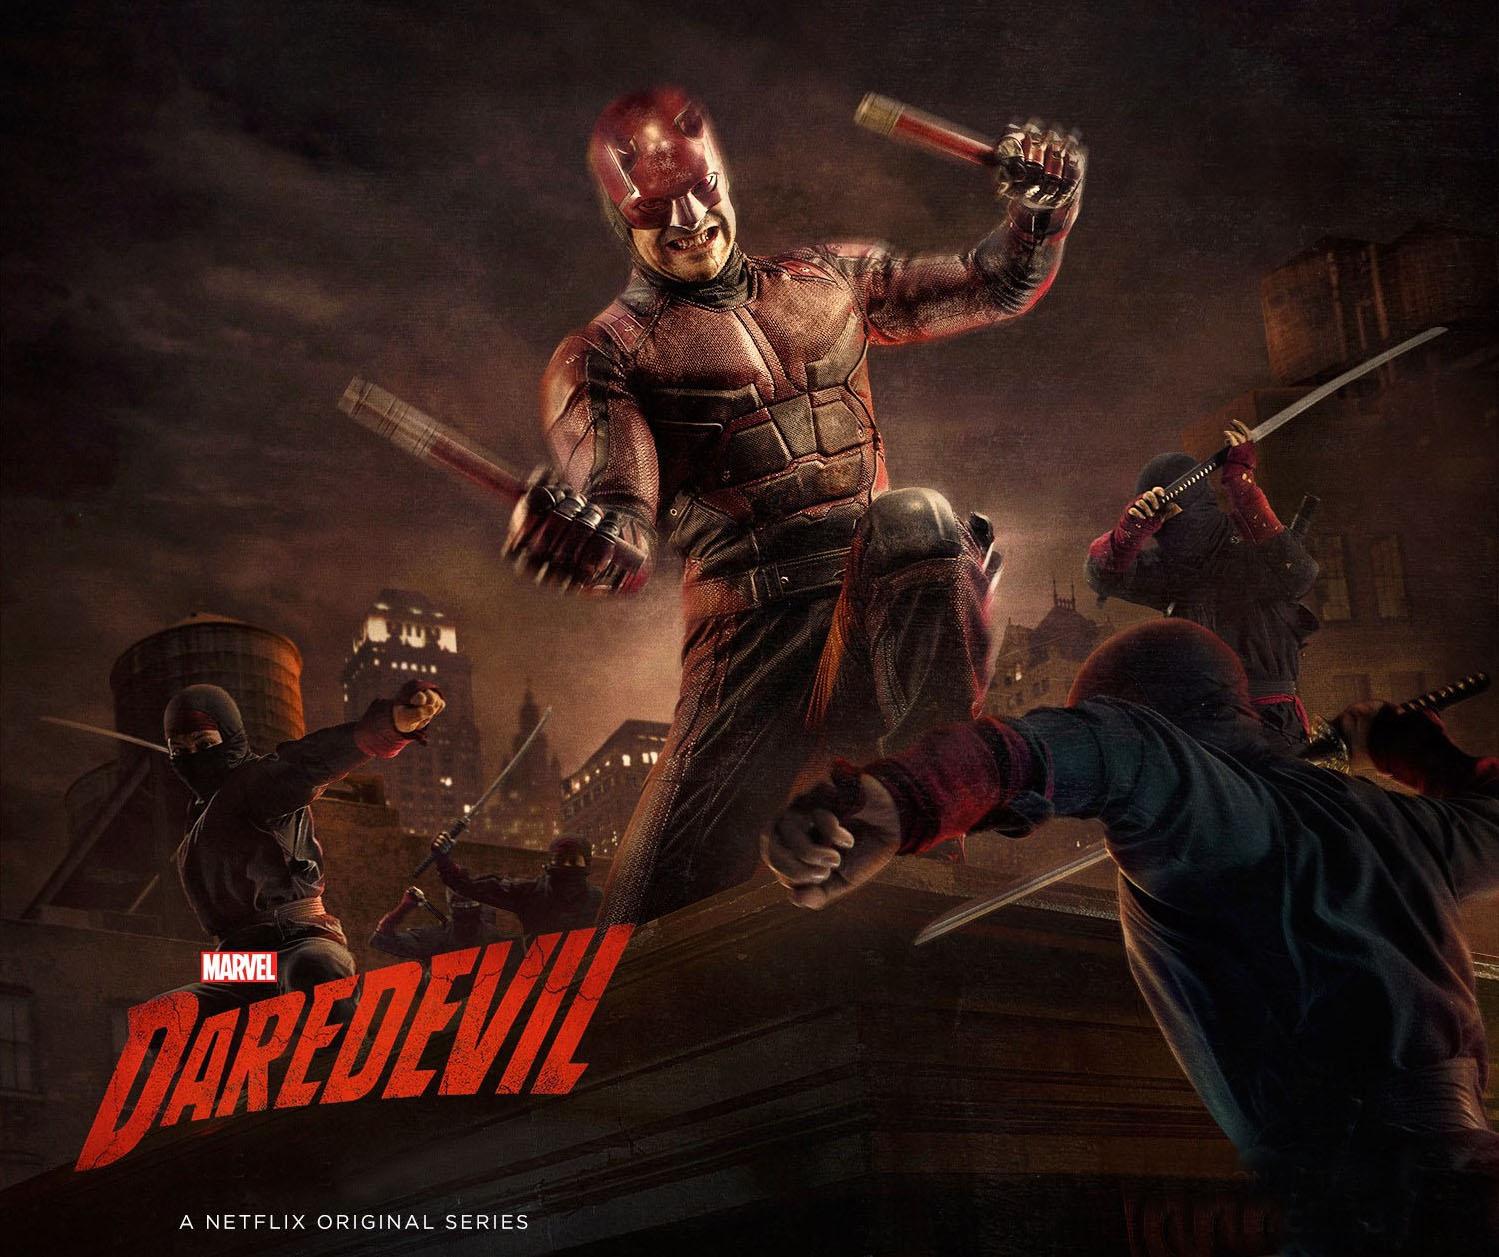 Daredevil-Season-2-New-Poster-Full-Size.jpeg